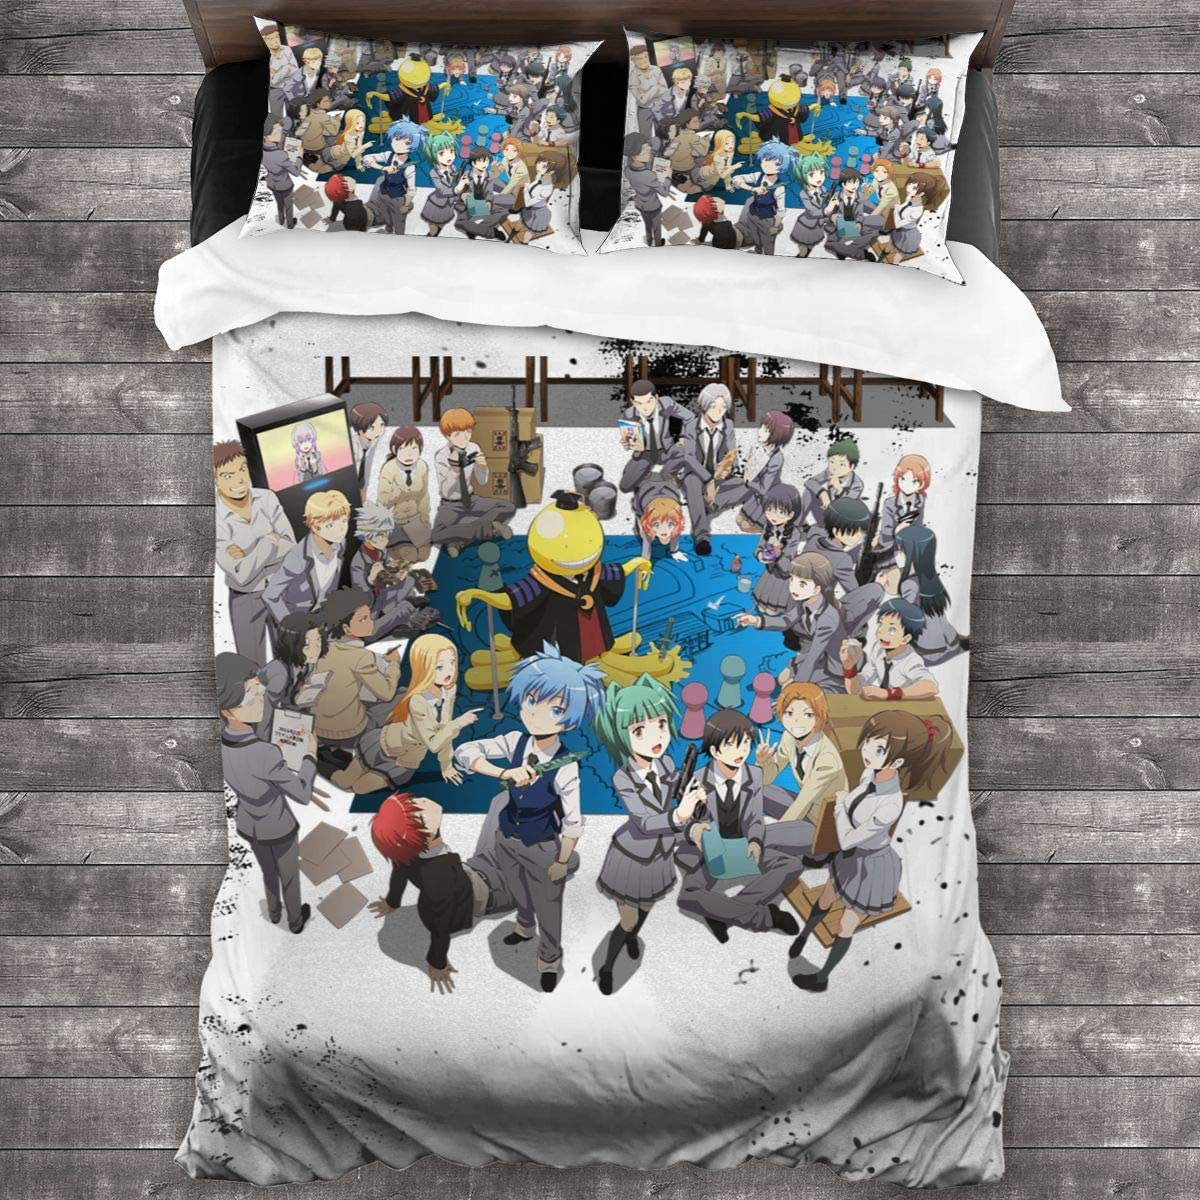 SUNERLADY サービス 限定品 Assassination Classroom 3-Piece Bedding Set Micro Bed